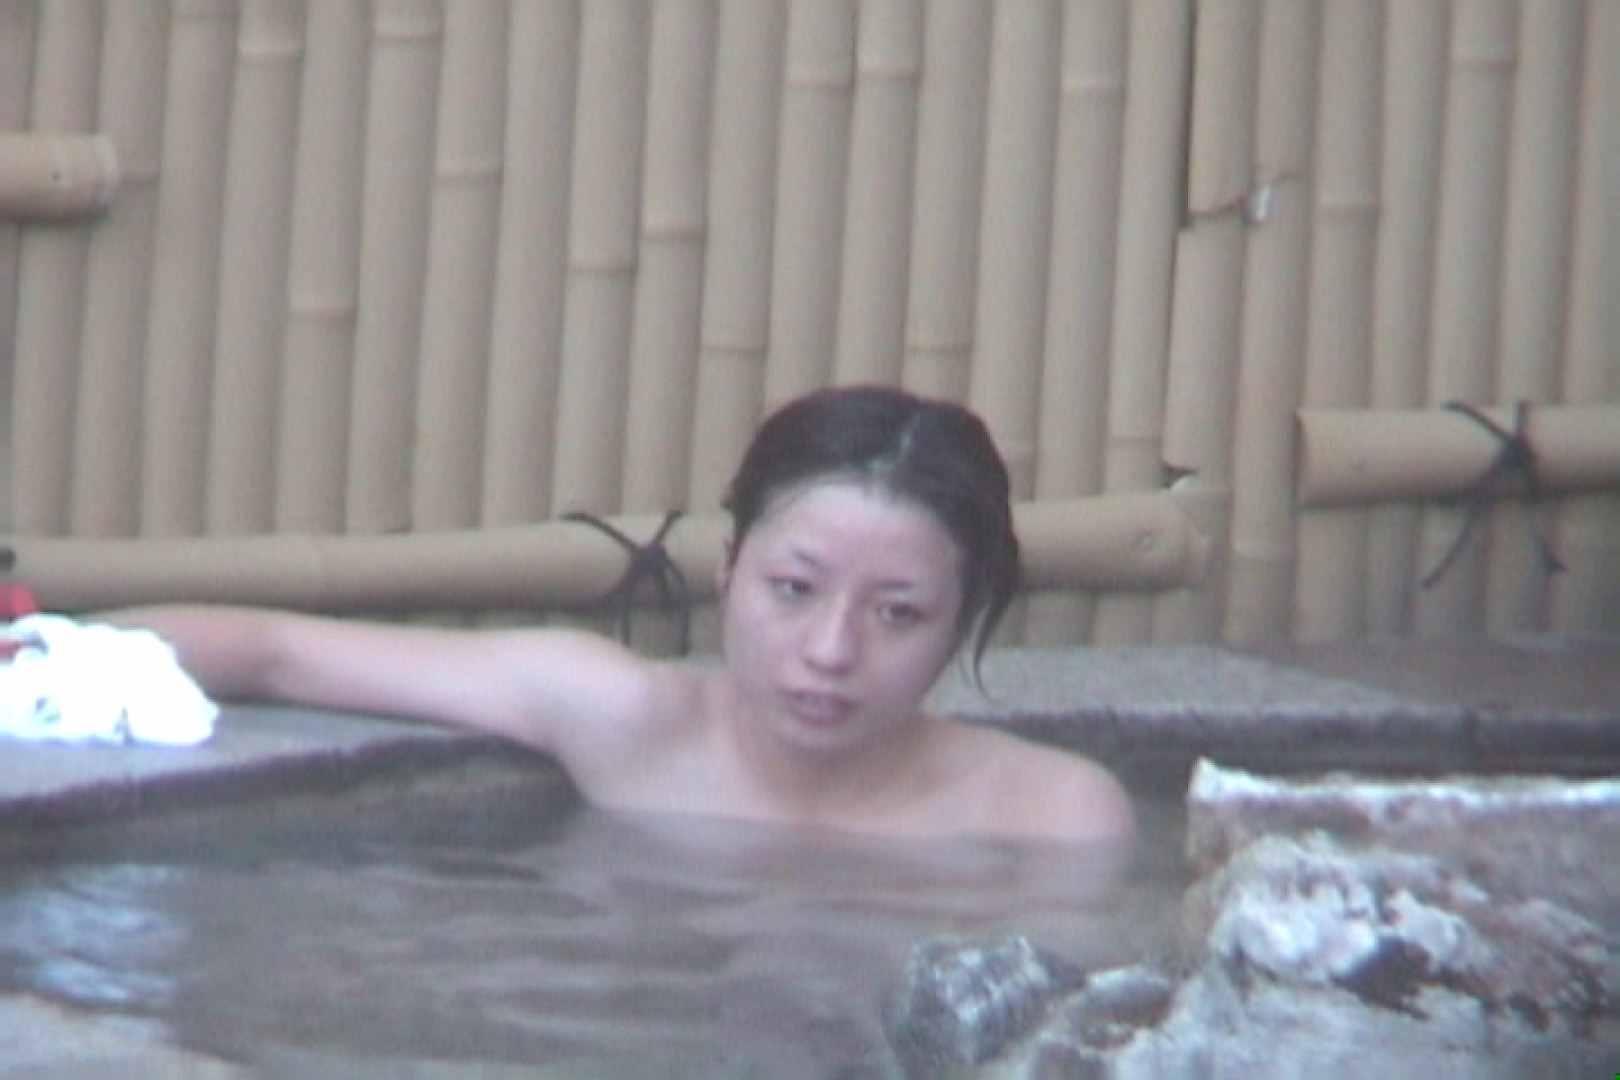 Aquaな露天風呂Vol.608 露天風呂突入 | 盗撮師作品  95pic 46